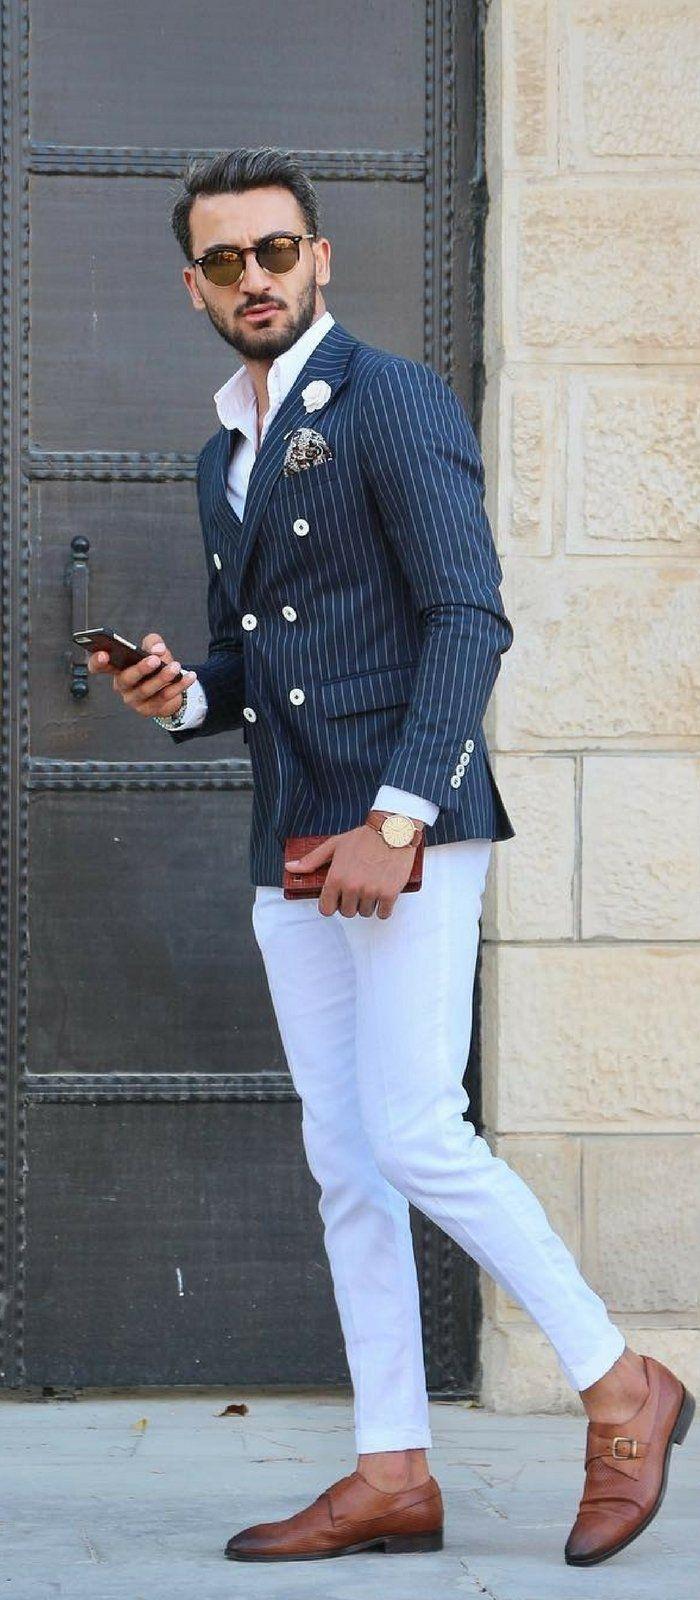 11 Smart Edgy Outfit Ideas For Men Men S Fashion Mens Fashion